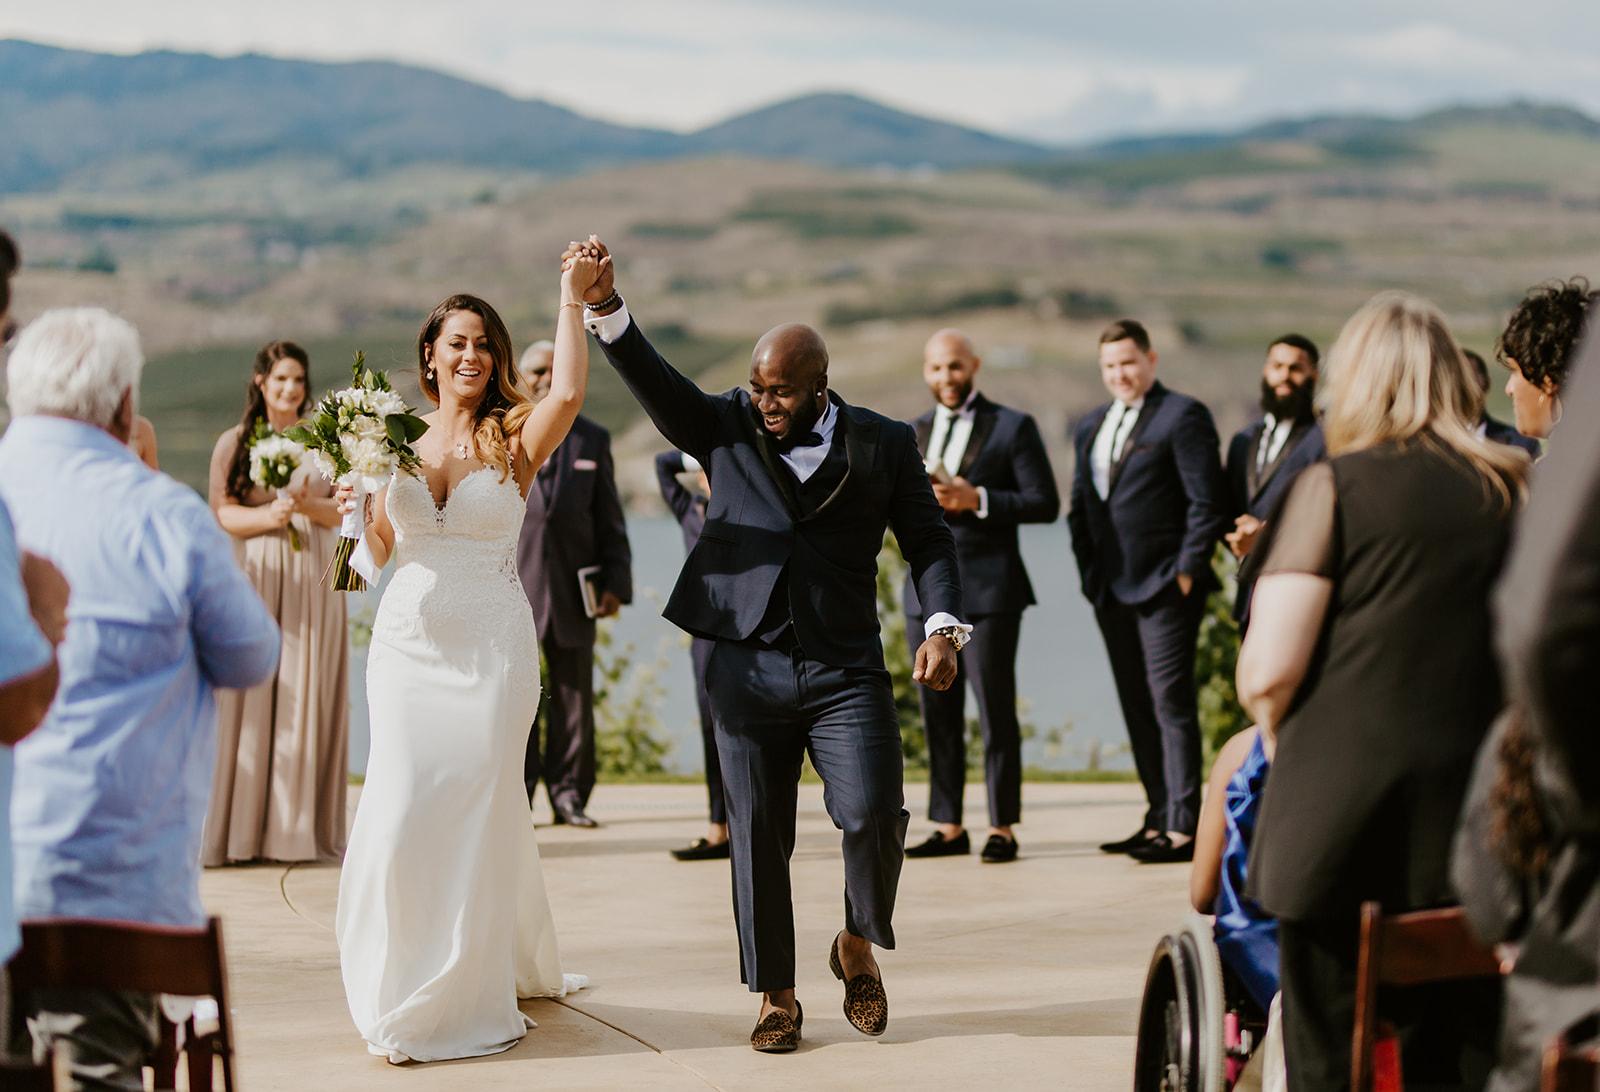 Danielle + Shey- Wedding Photos - Karma Vineyards - Sneak Peeks! - Meme Urbane Photography-17_websize.jpg